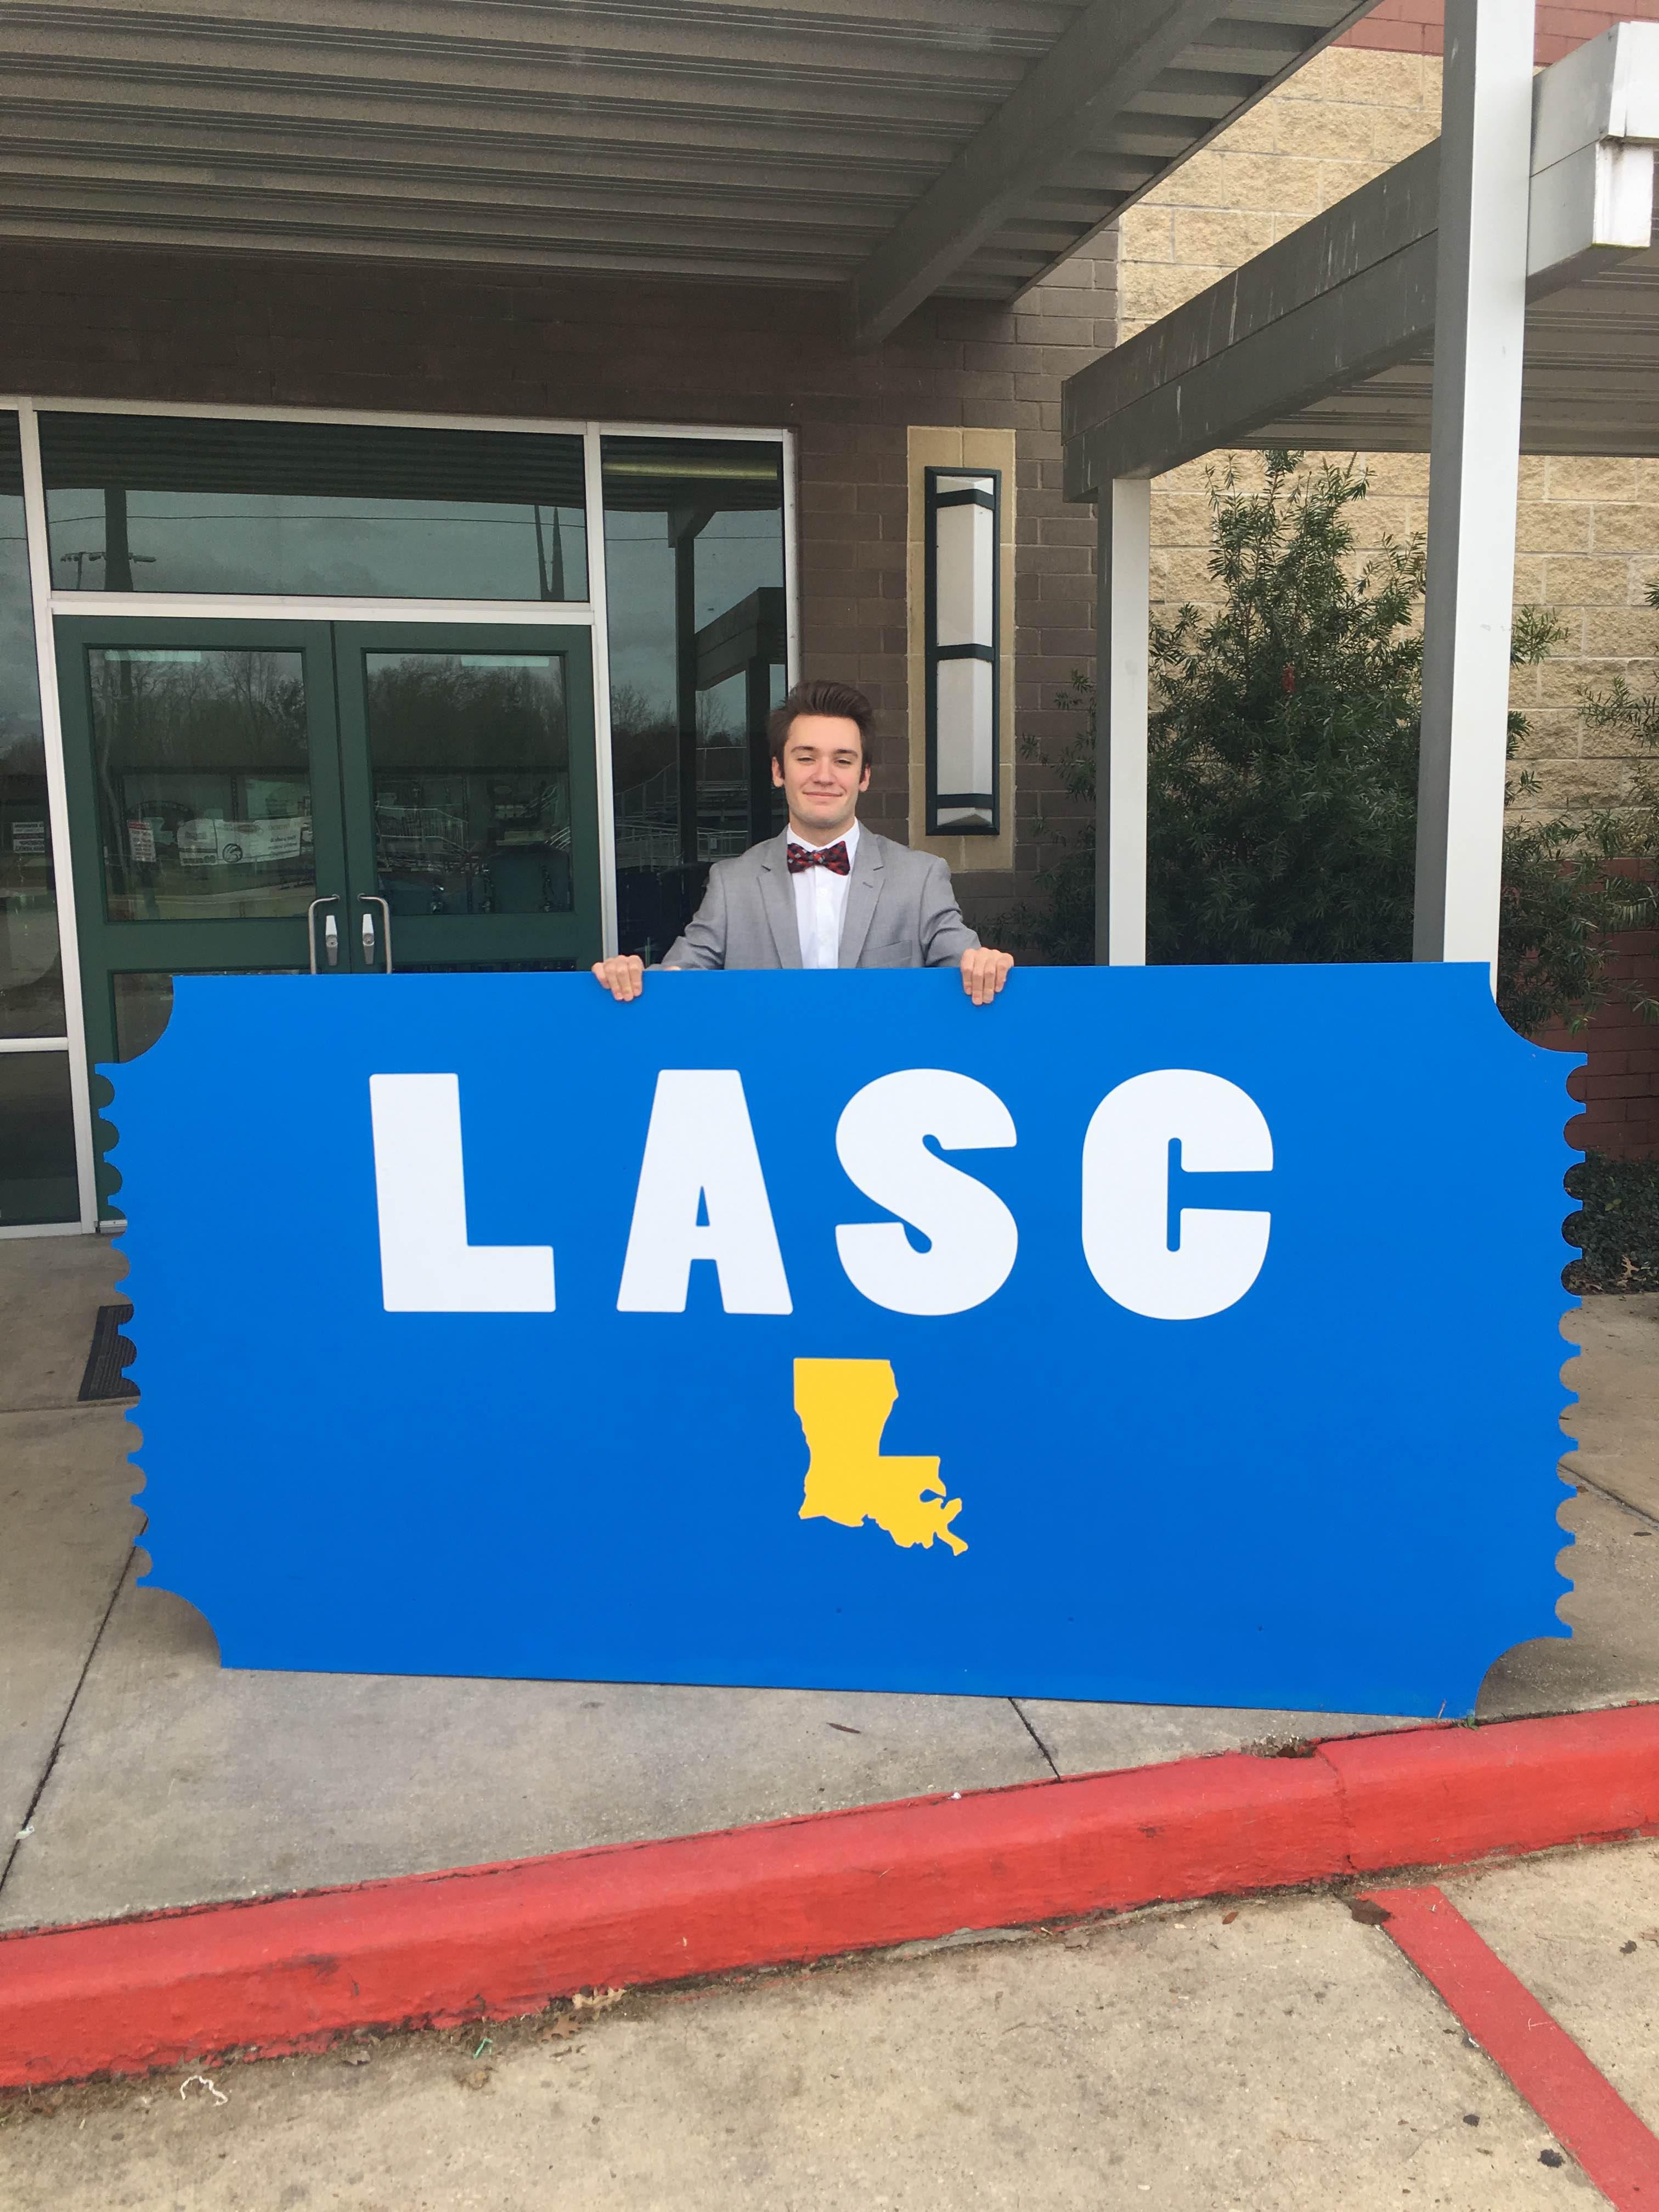 LASC District 1 President, Ben Calico